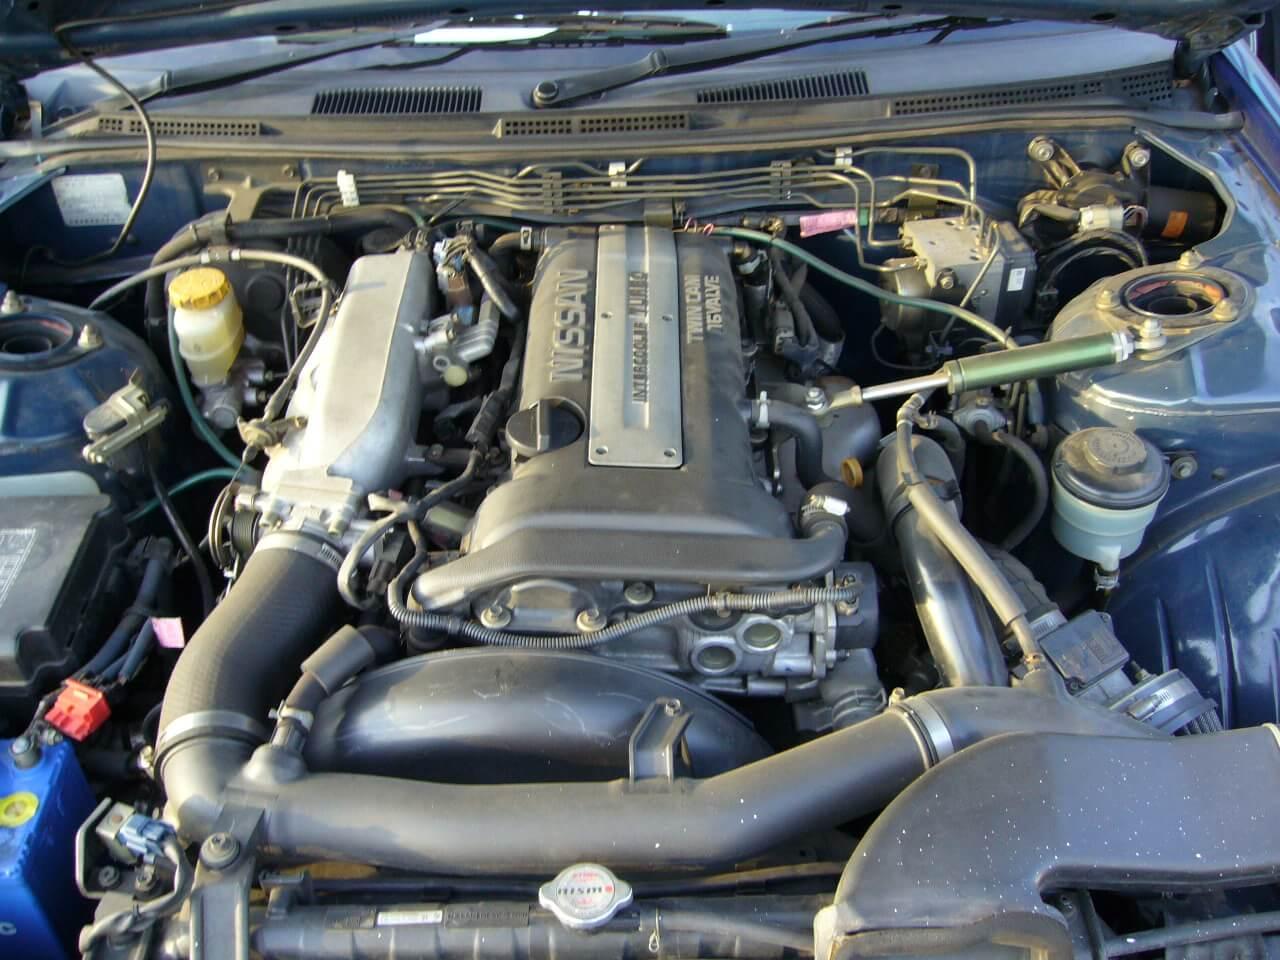 Nissan Silvia S15 Spec-R Blau Motor RB20